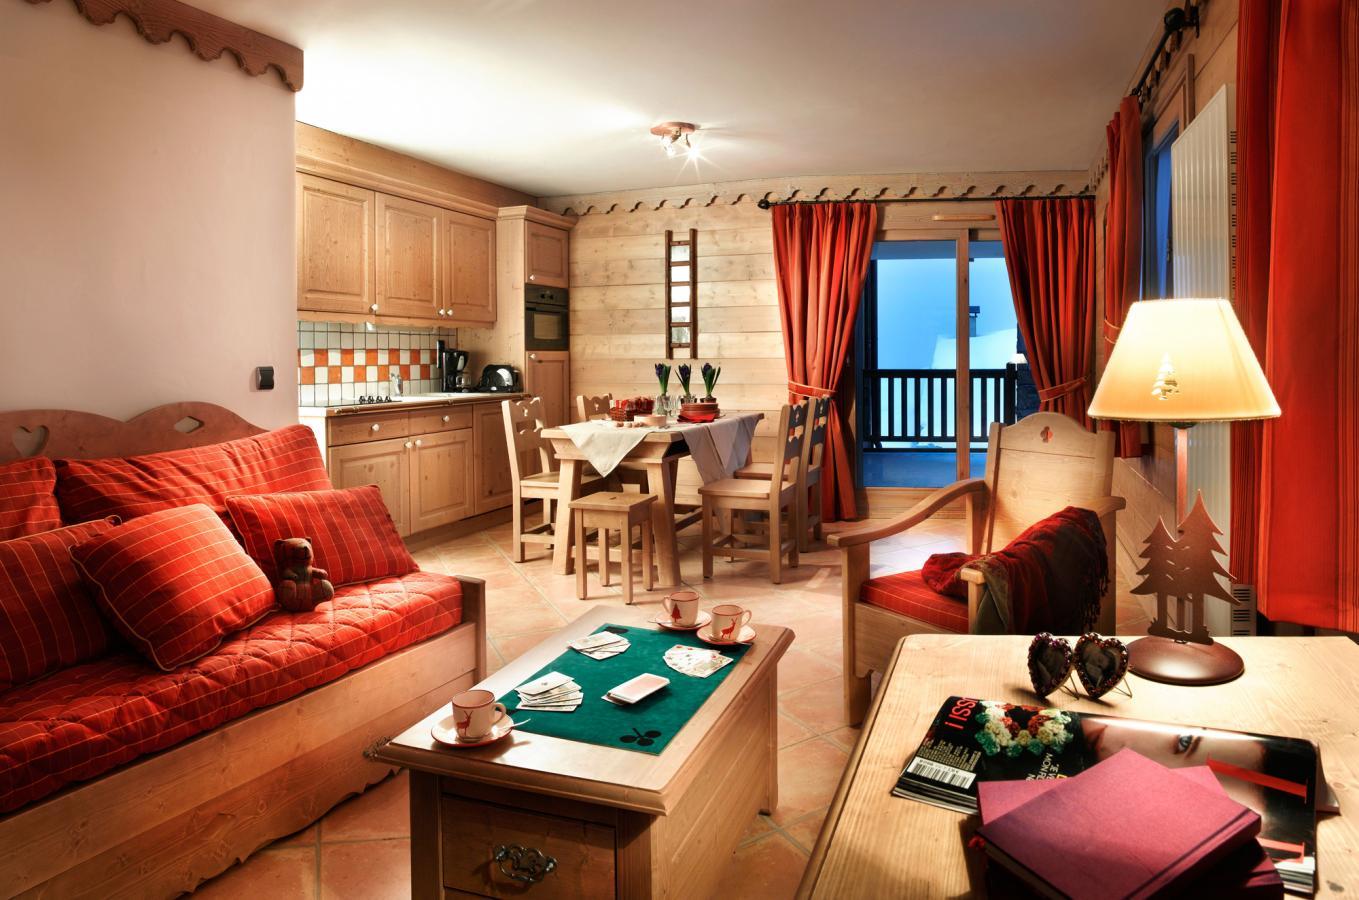 les cimes blanches 10 la rosi re location vacances ski la rosi re ski planet. Black Bedroom Furniture Sets. Home Design Ideas